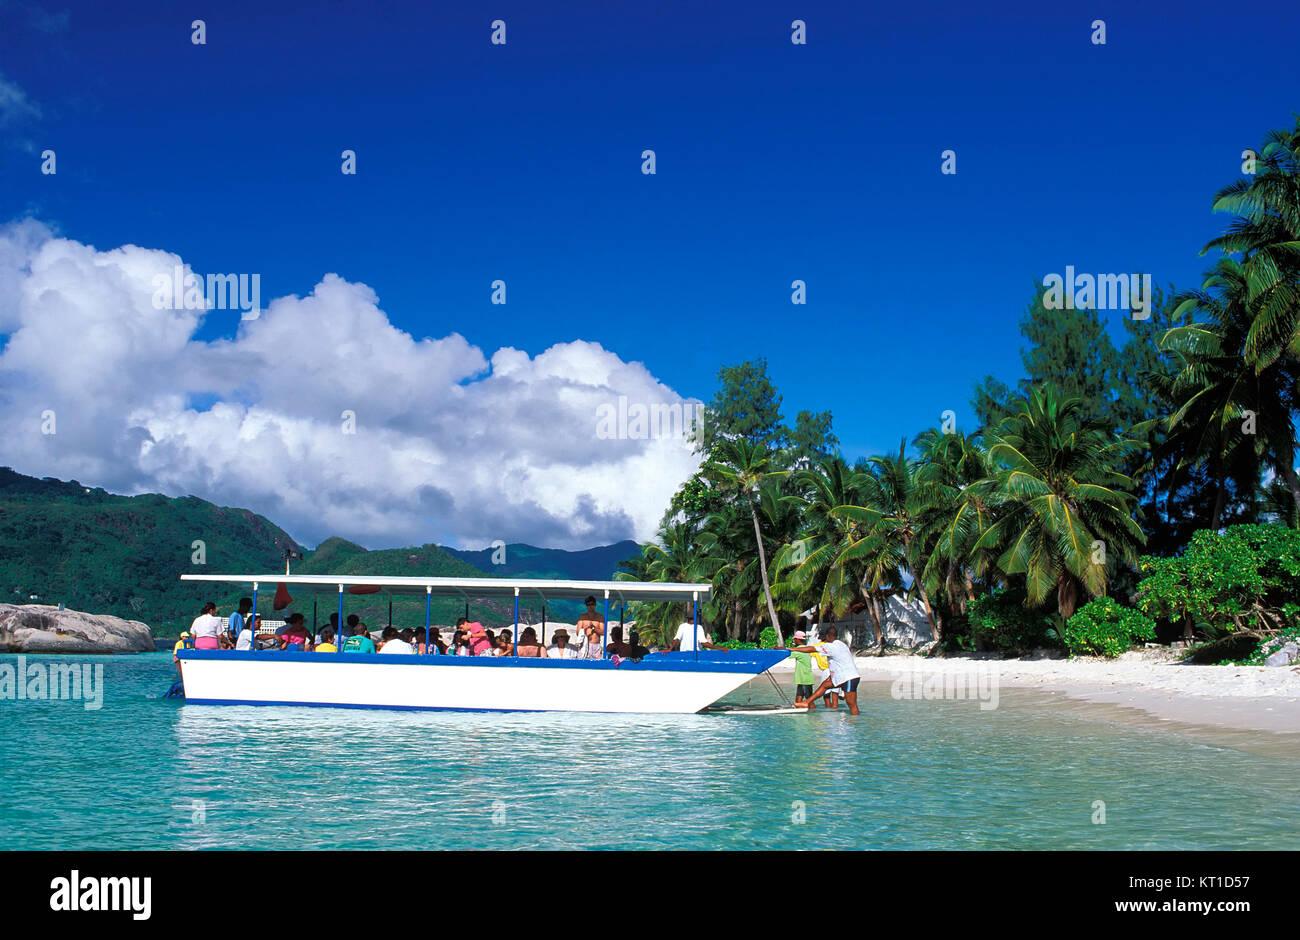 Boat-Tript to Therese island, Mahe island, Seychelles - Stock Image